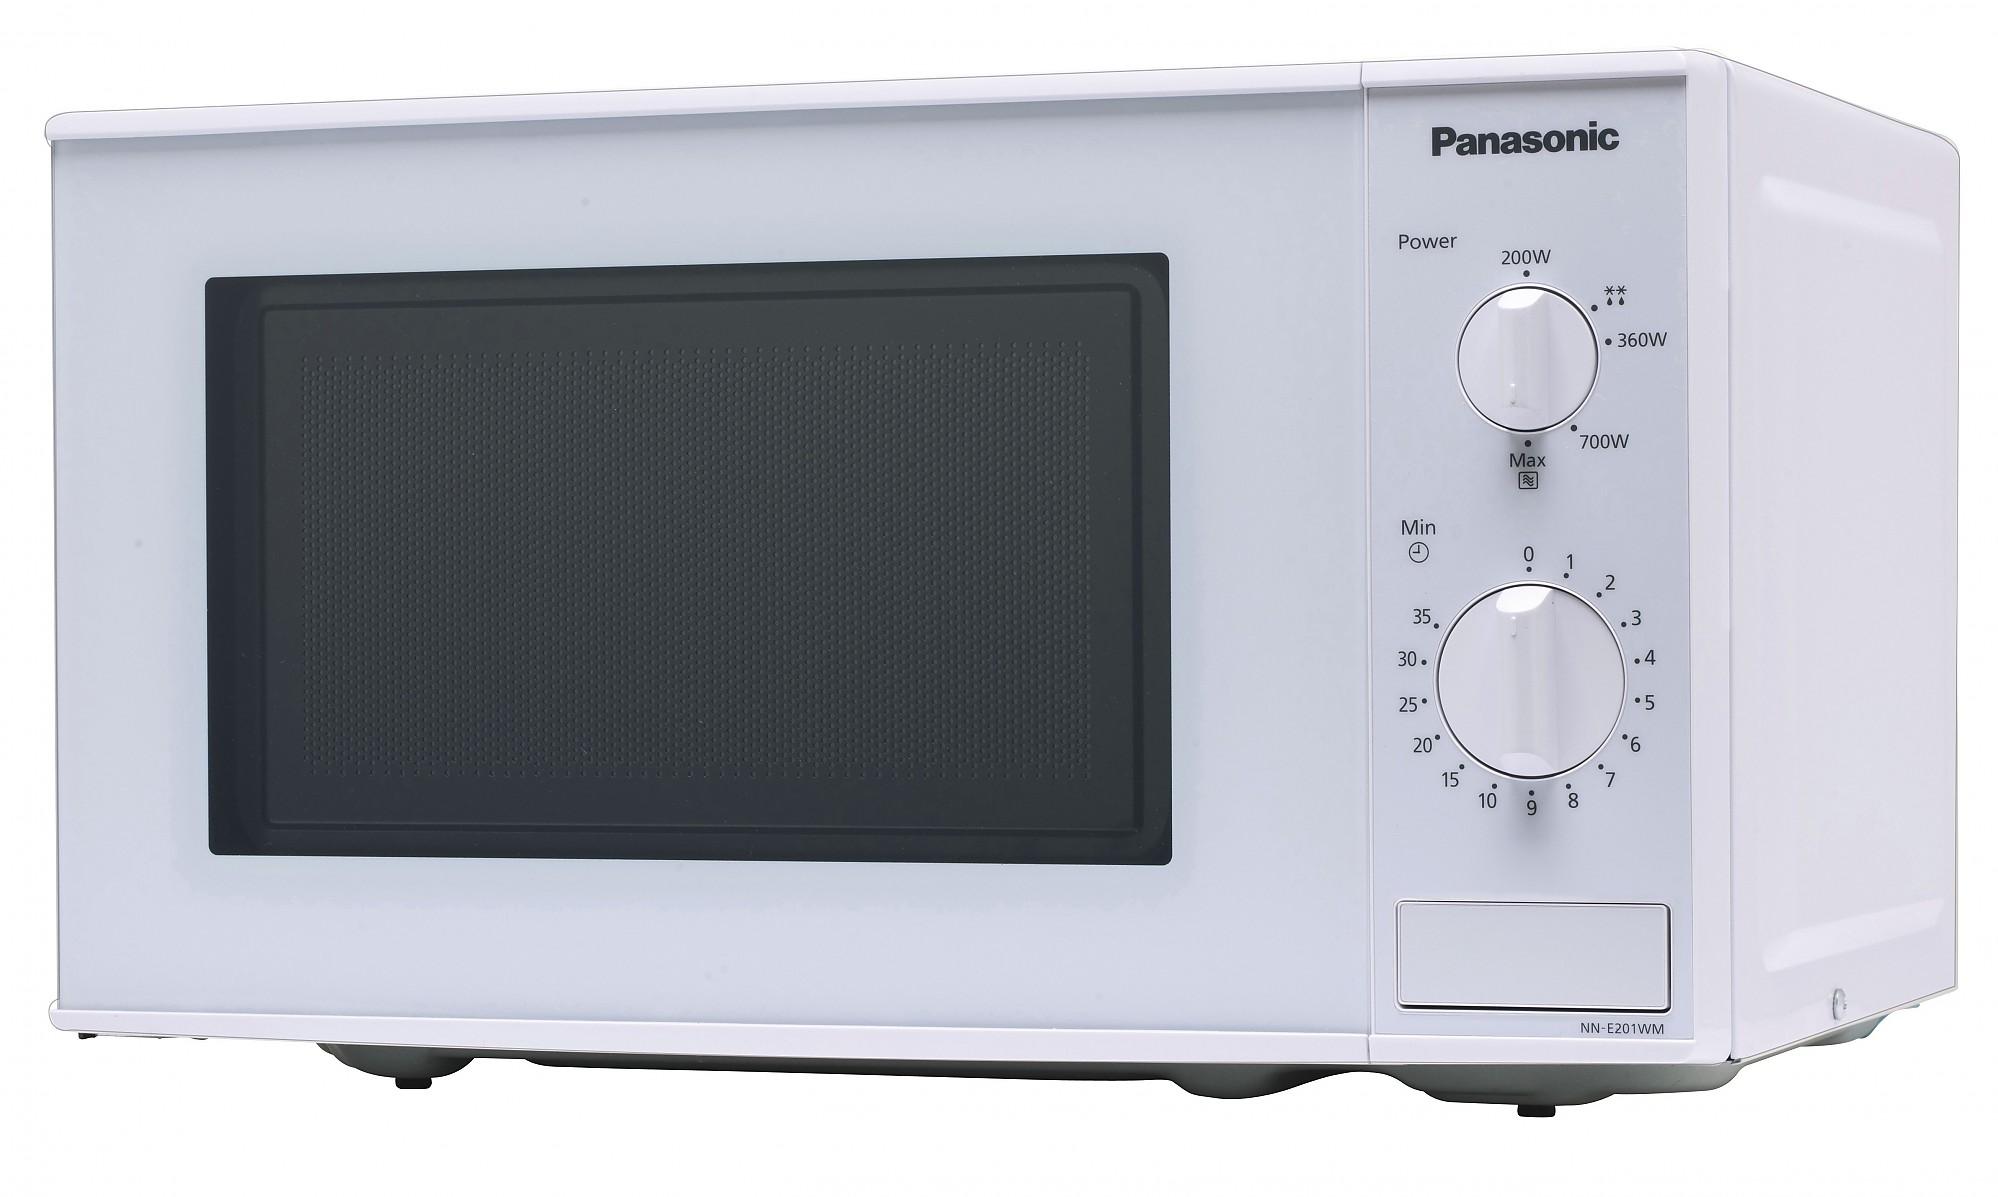 Cuptor cu microunde Panasonic NN-E201WMEPG 800W Mecanic